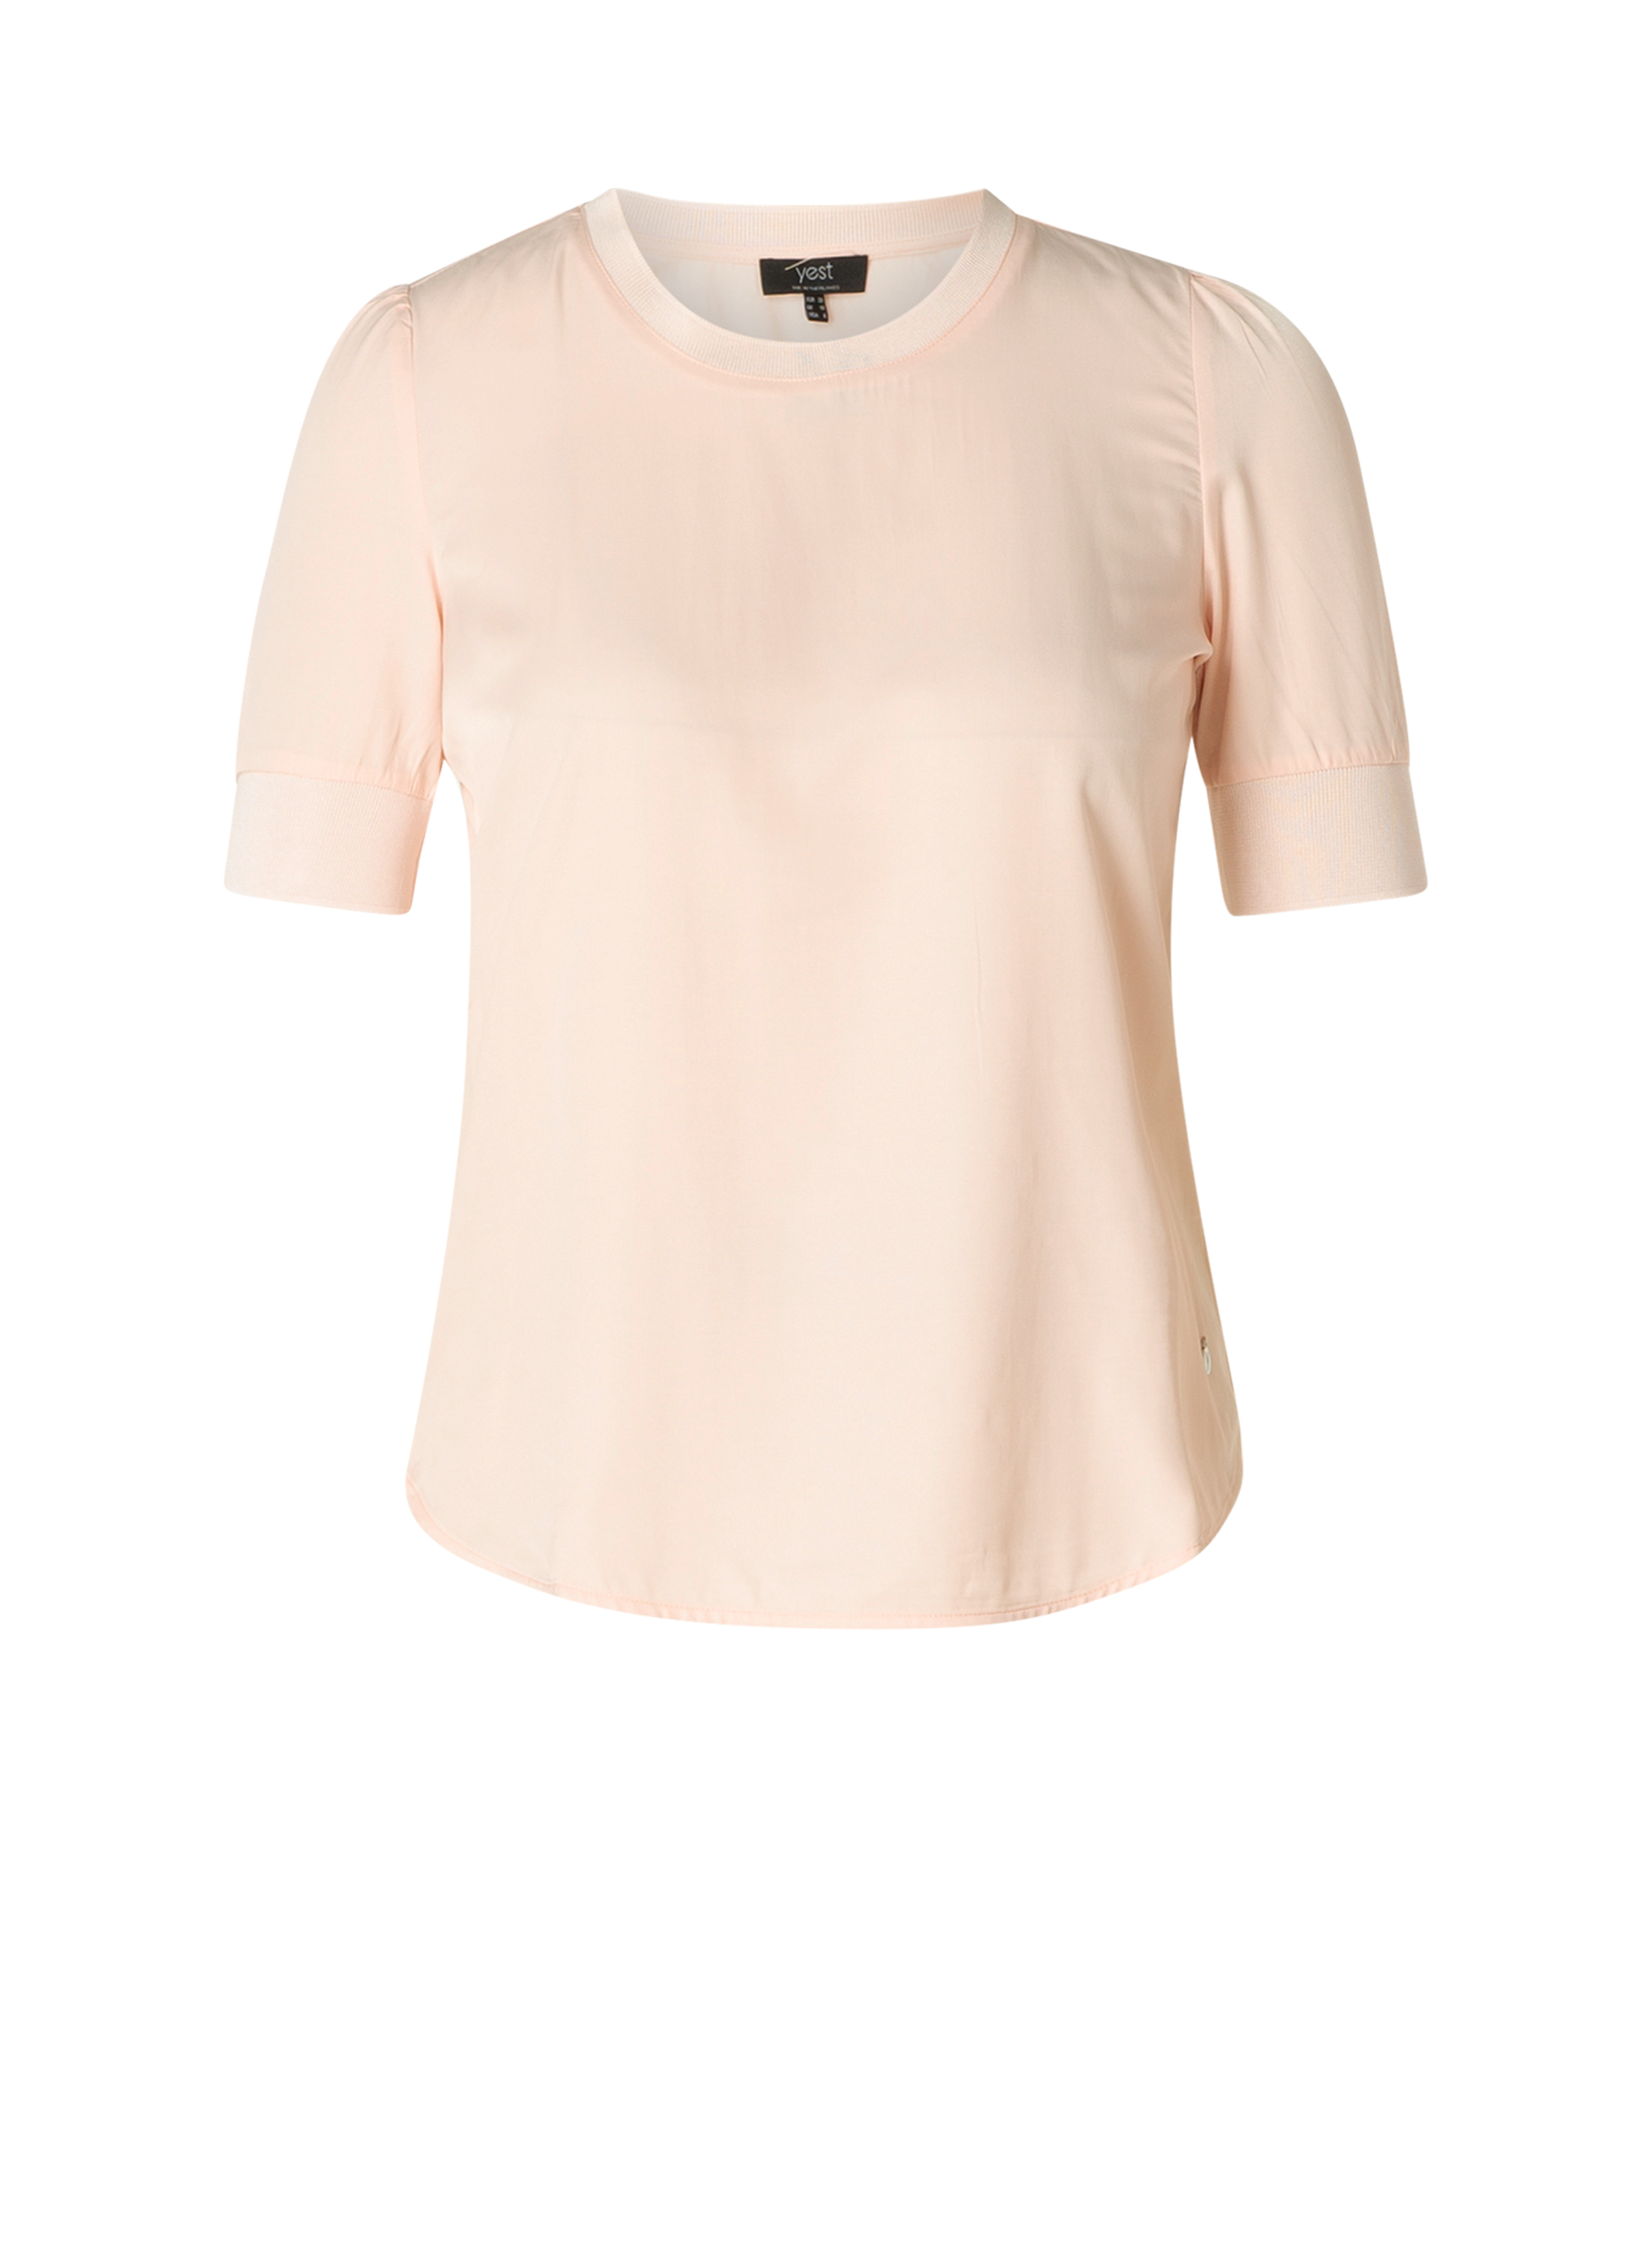 Yest shirt Ine 64 cm